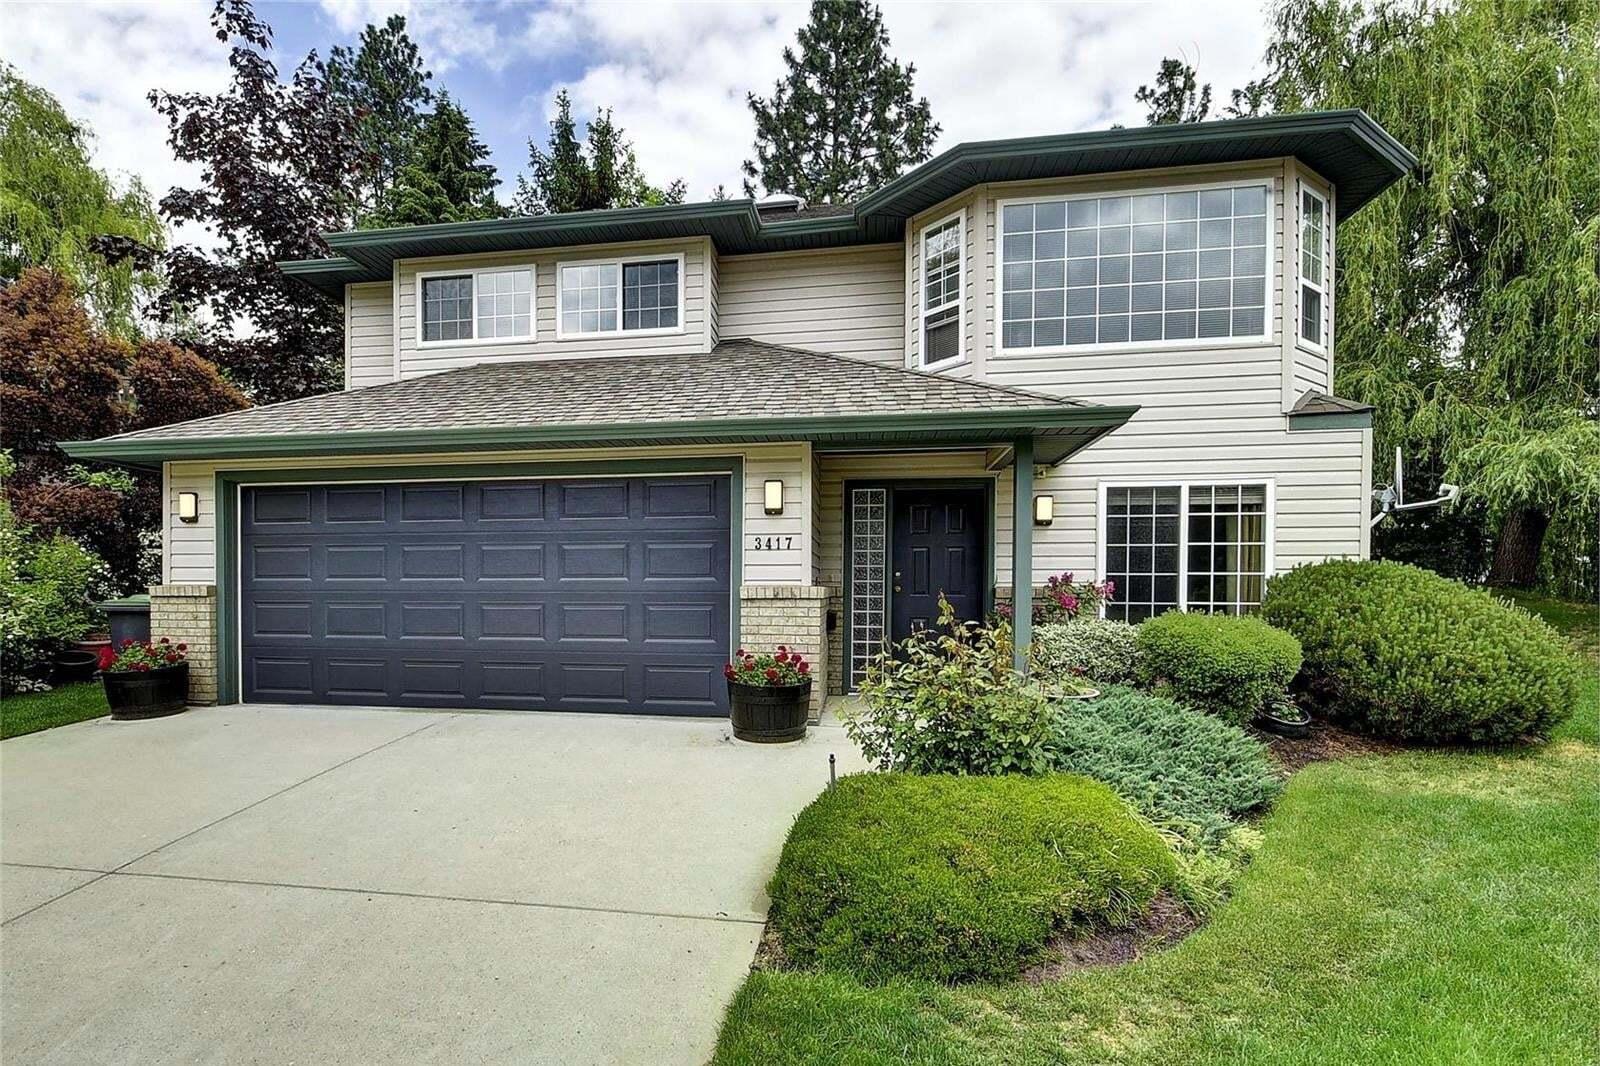 House for sale at 3417 Rosedale Ct West Kelowna British Columbia - MLS: 10207531